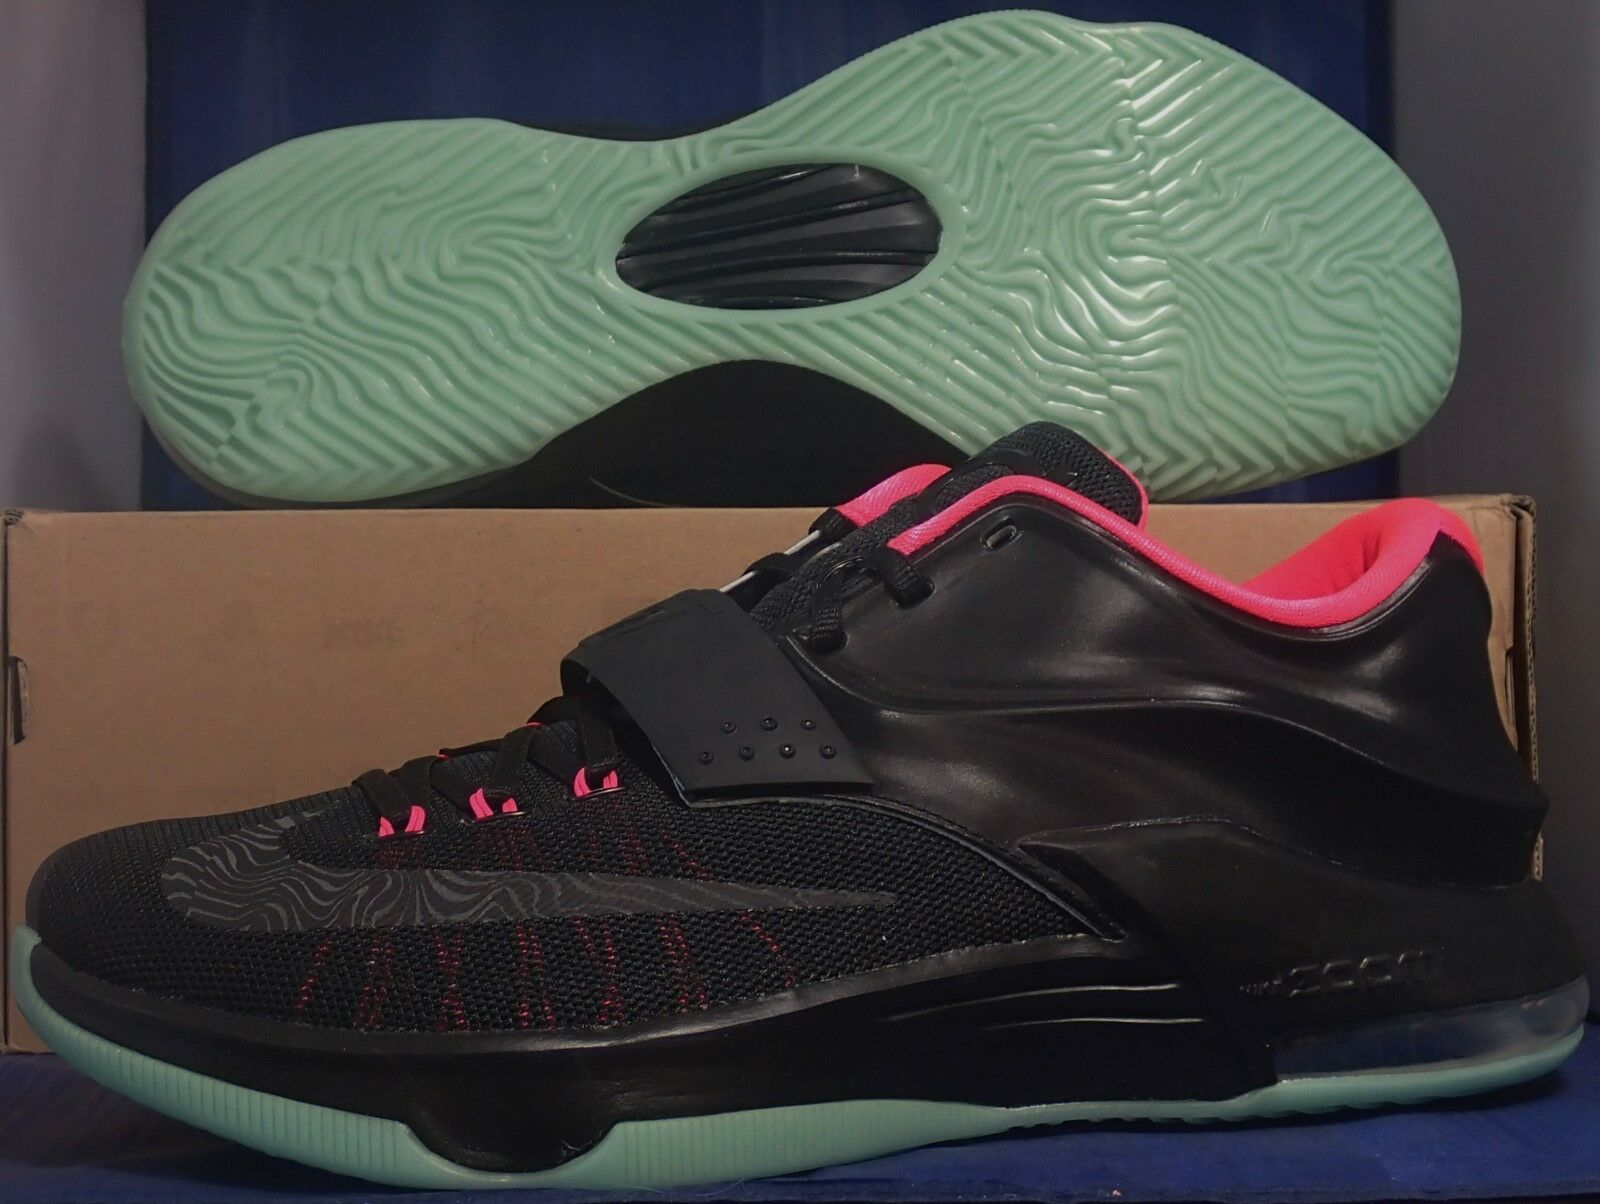 Nike KD VII 7 vert iD Noir rose Mint vert 7 Yeezy Kevin Durant SZ 12 f9e188